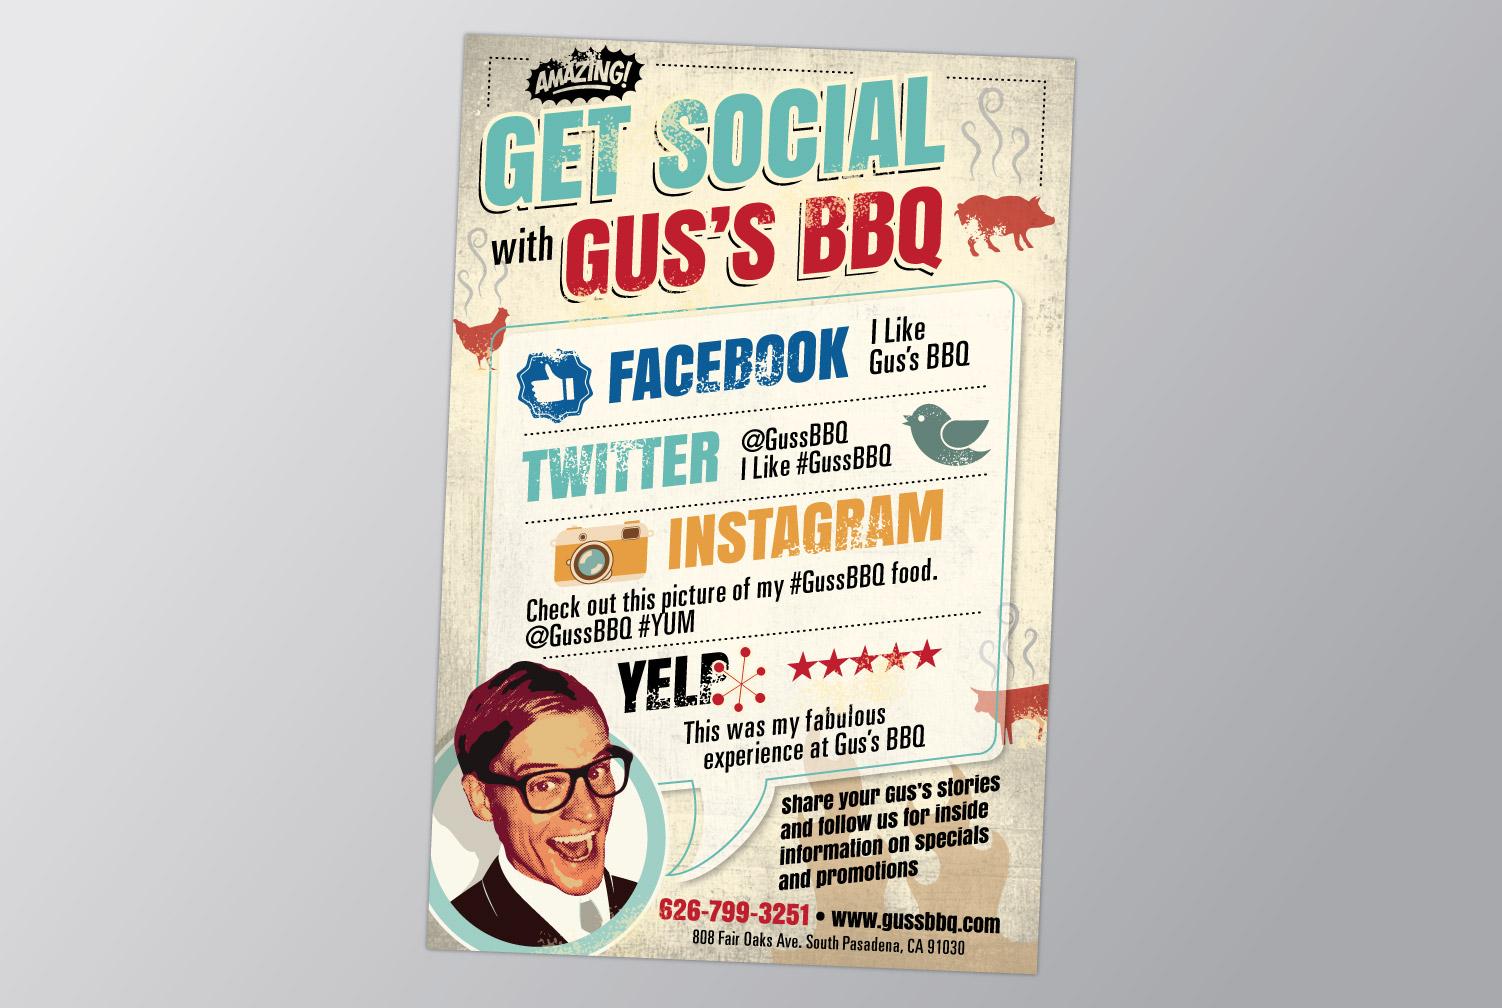 Gus's BBQ Postcard Promo